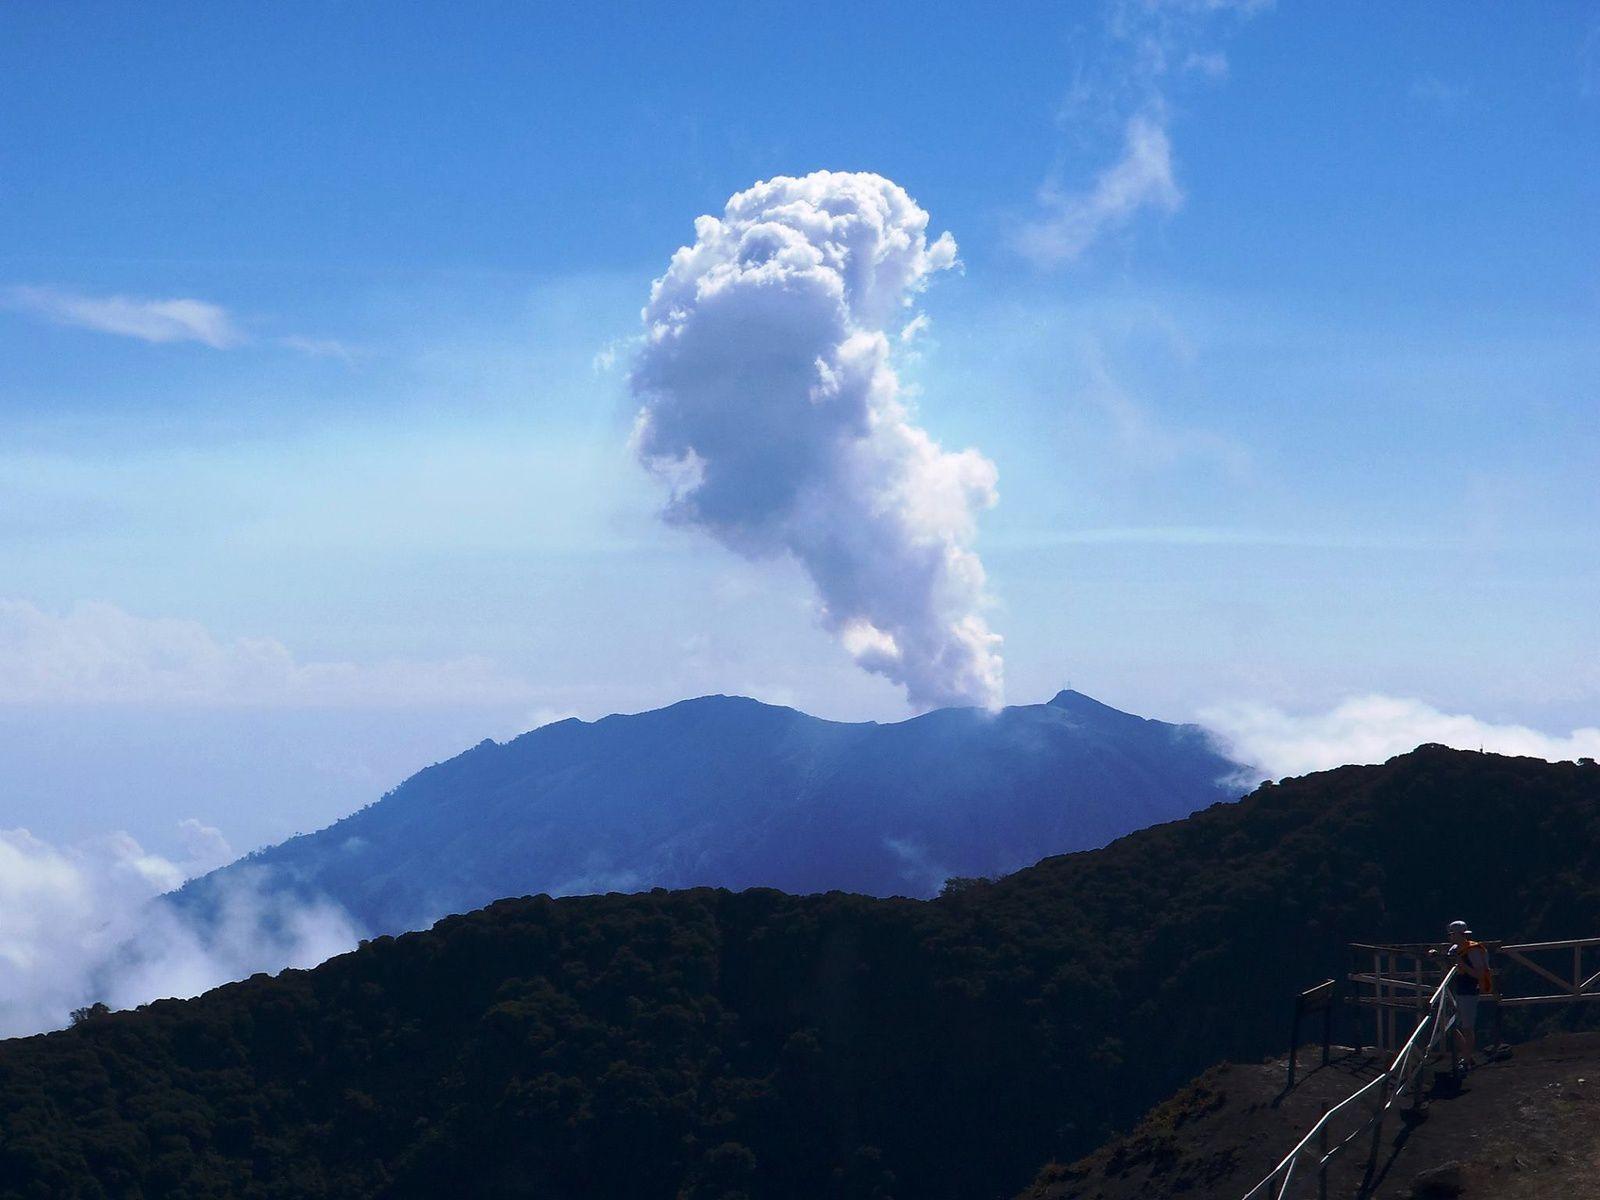 Panache du Turrialba, vu du volcan Irazu le 13.04.2017 -  photo vulcanólogo Gerardo Soto de la RSN.